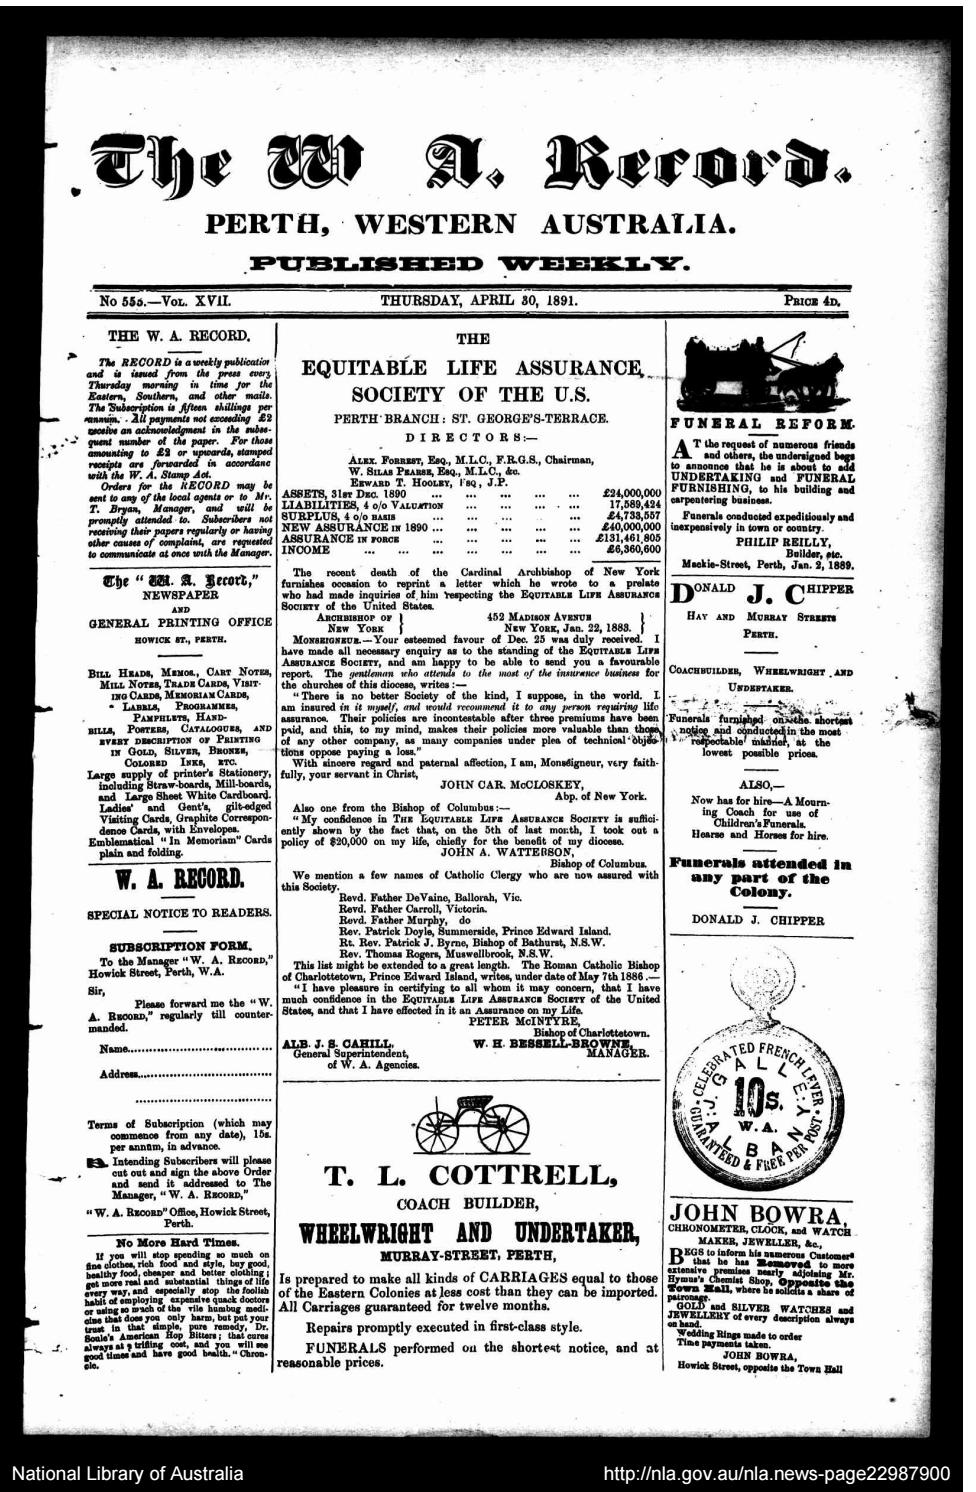 A rischio falena Quasi  The Record Newspaper - 30 April 1891 by The Record - issuu